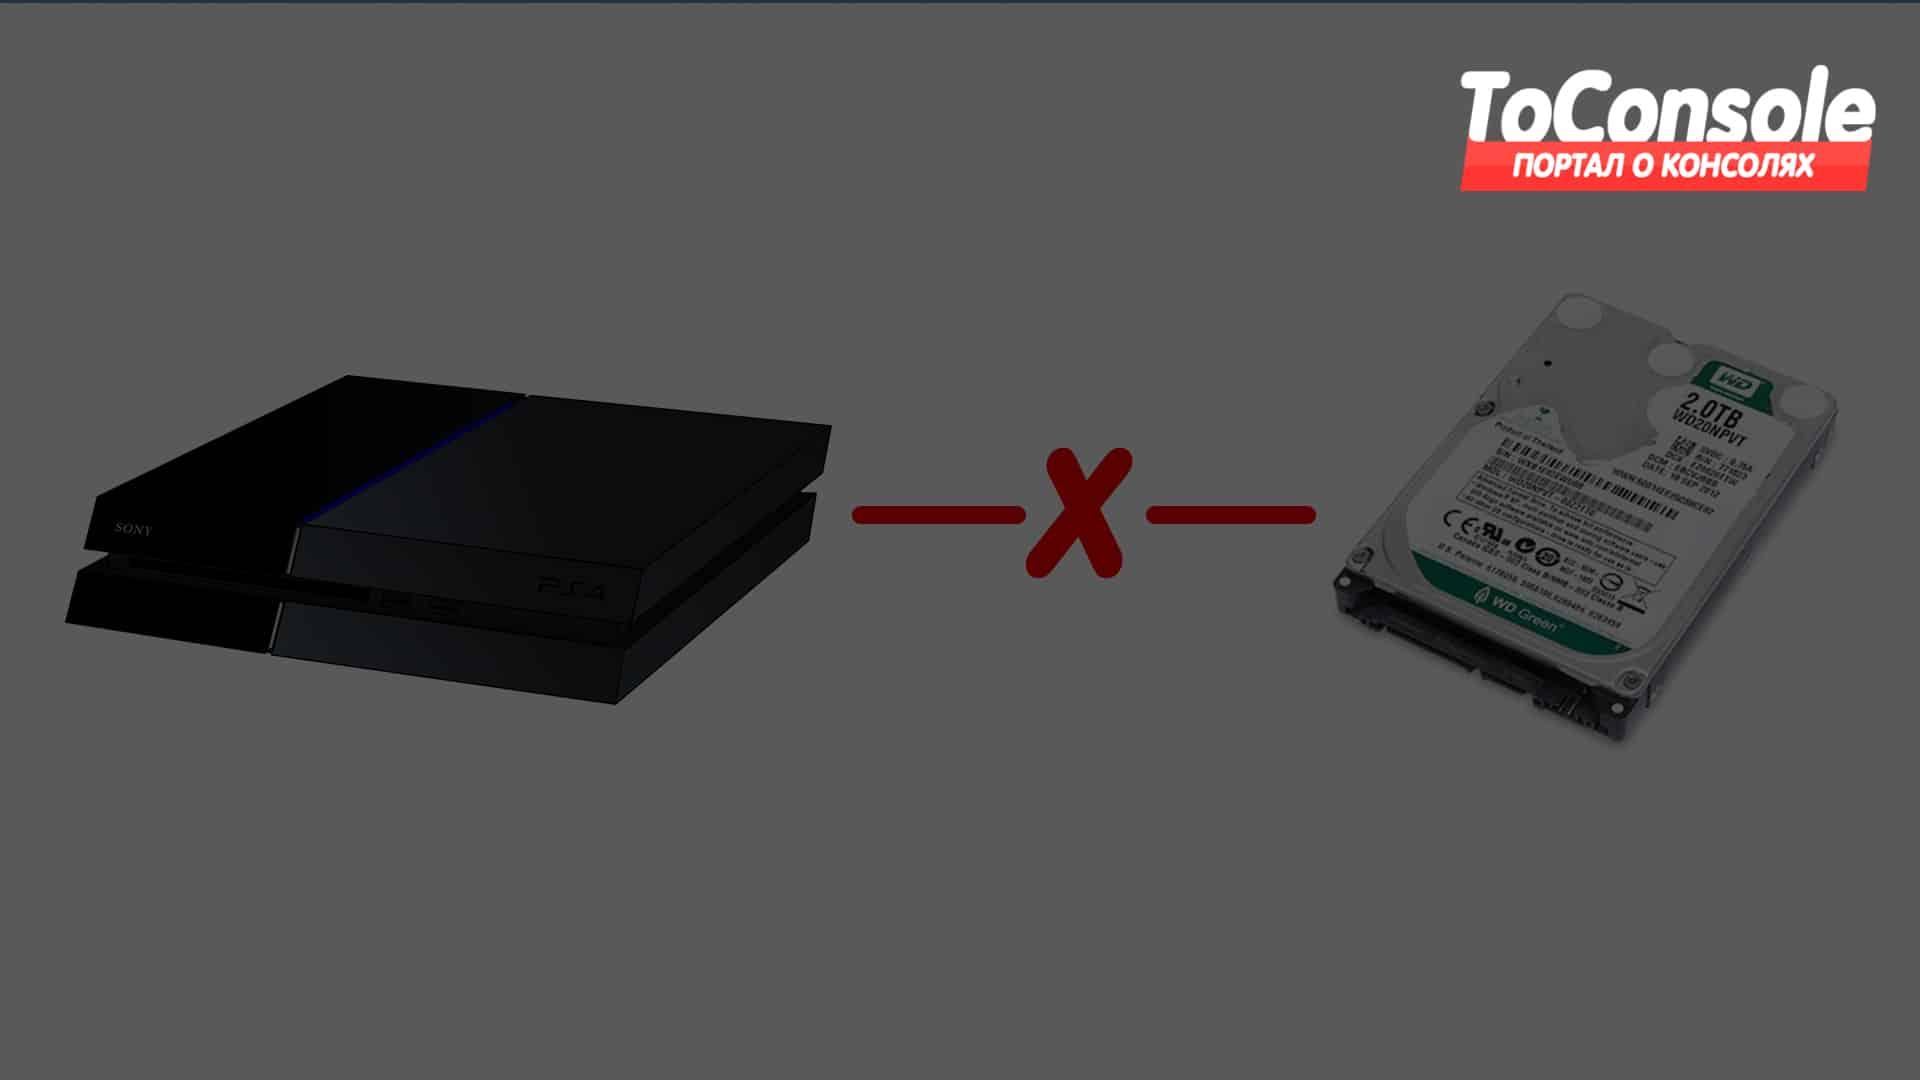 Нет доступа к системному накопителю PS4 код ошибки CE-34335-8